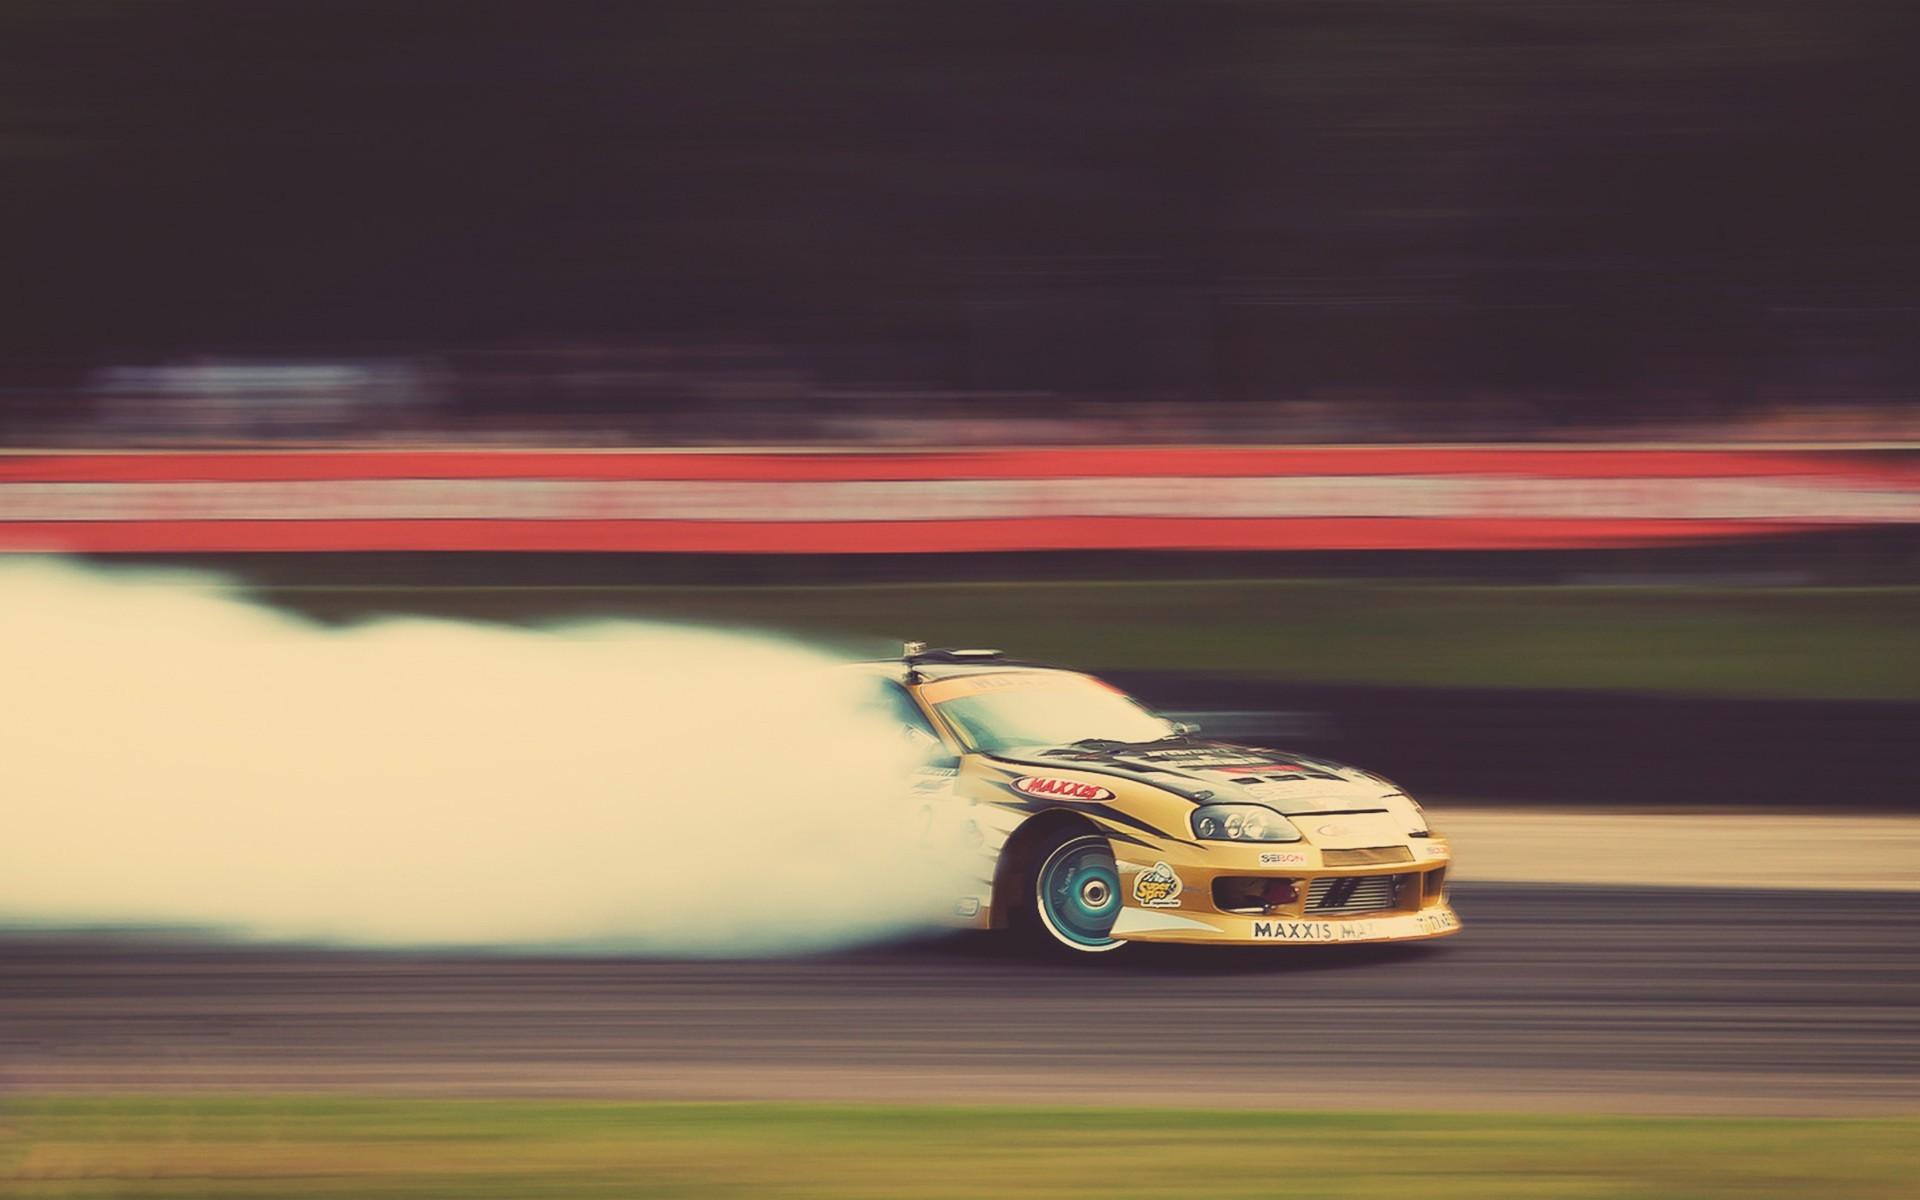 General 1920x1200 drift car vehicle sport  drift cars Toyota Supra Toyota Motorsport smoke